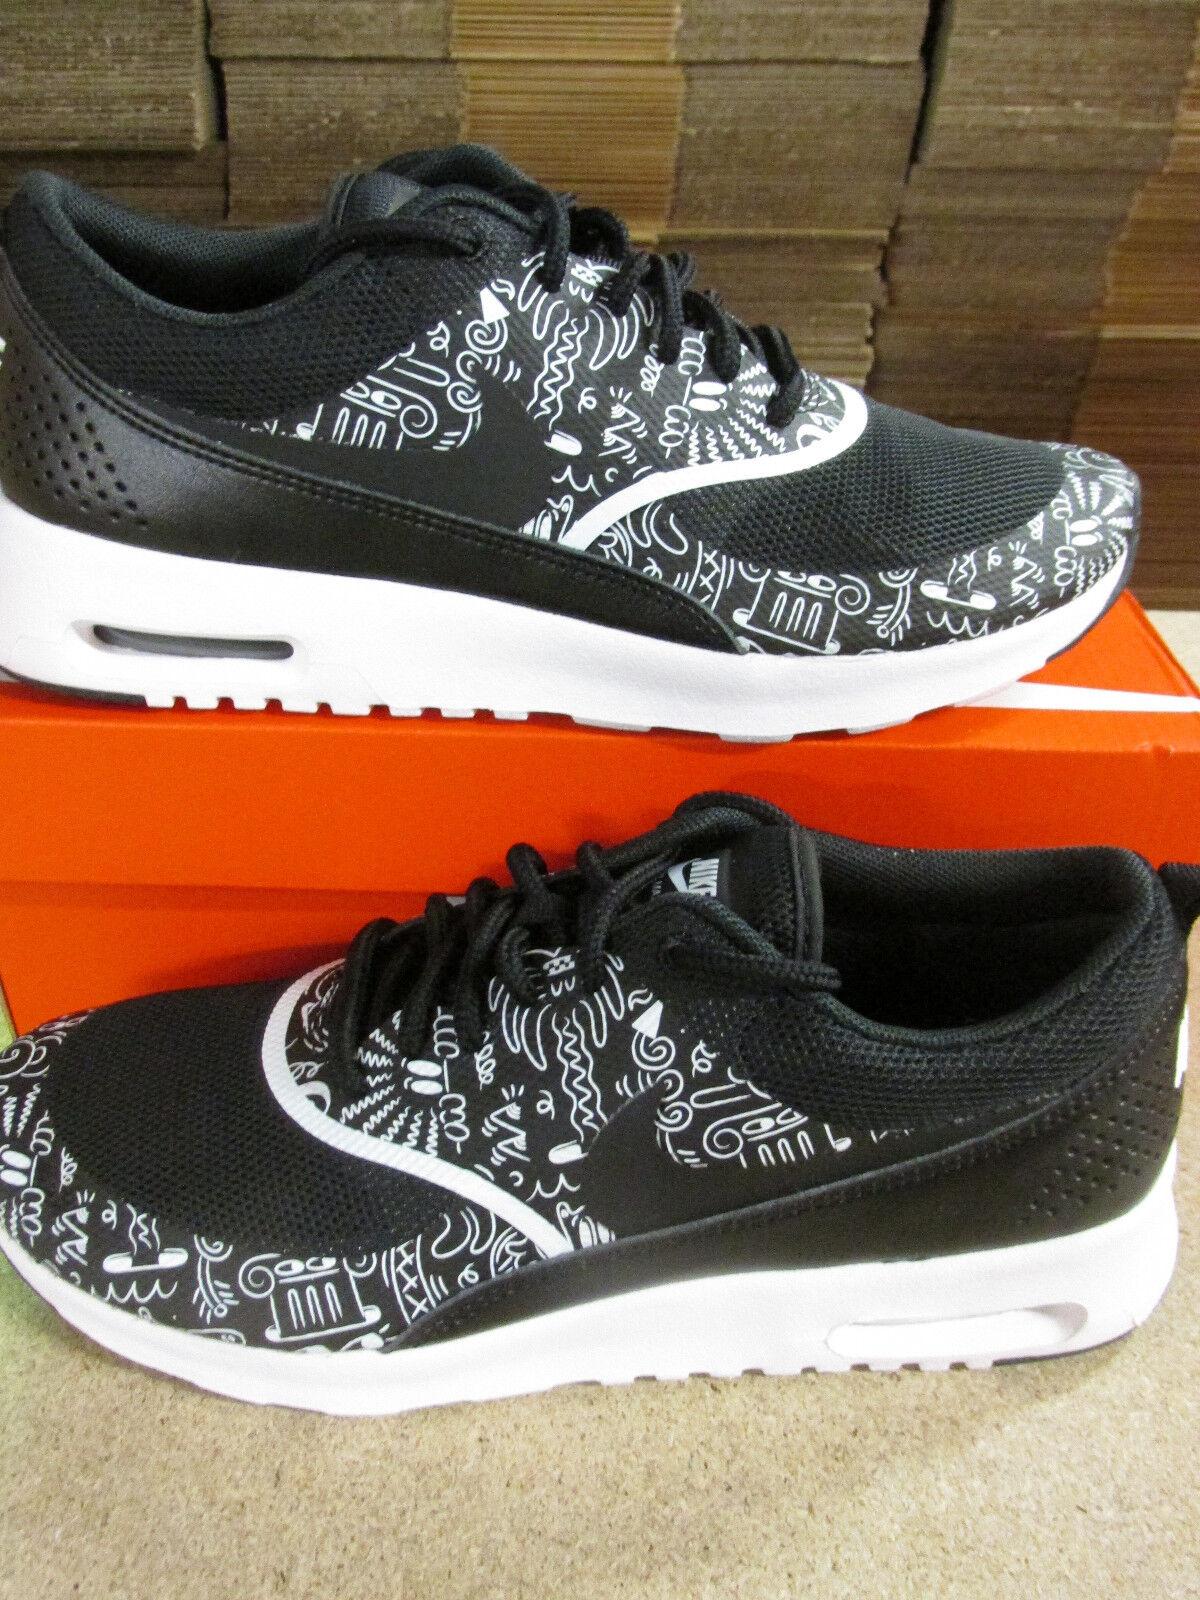 Para mujer Nike Air Max Thea Print Tenis Deportivas Zapatos Correr Zapatillas 599408 011